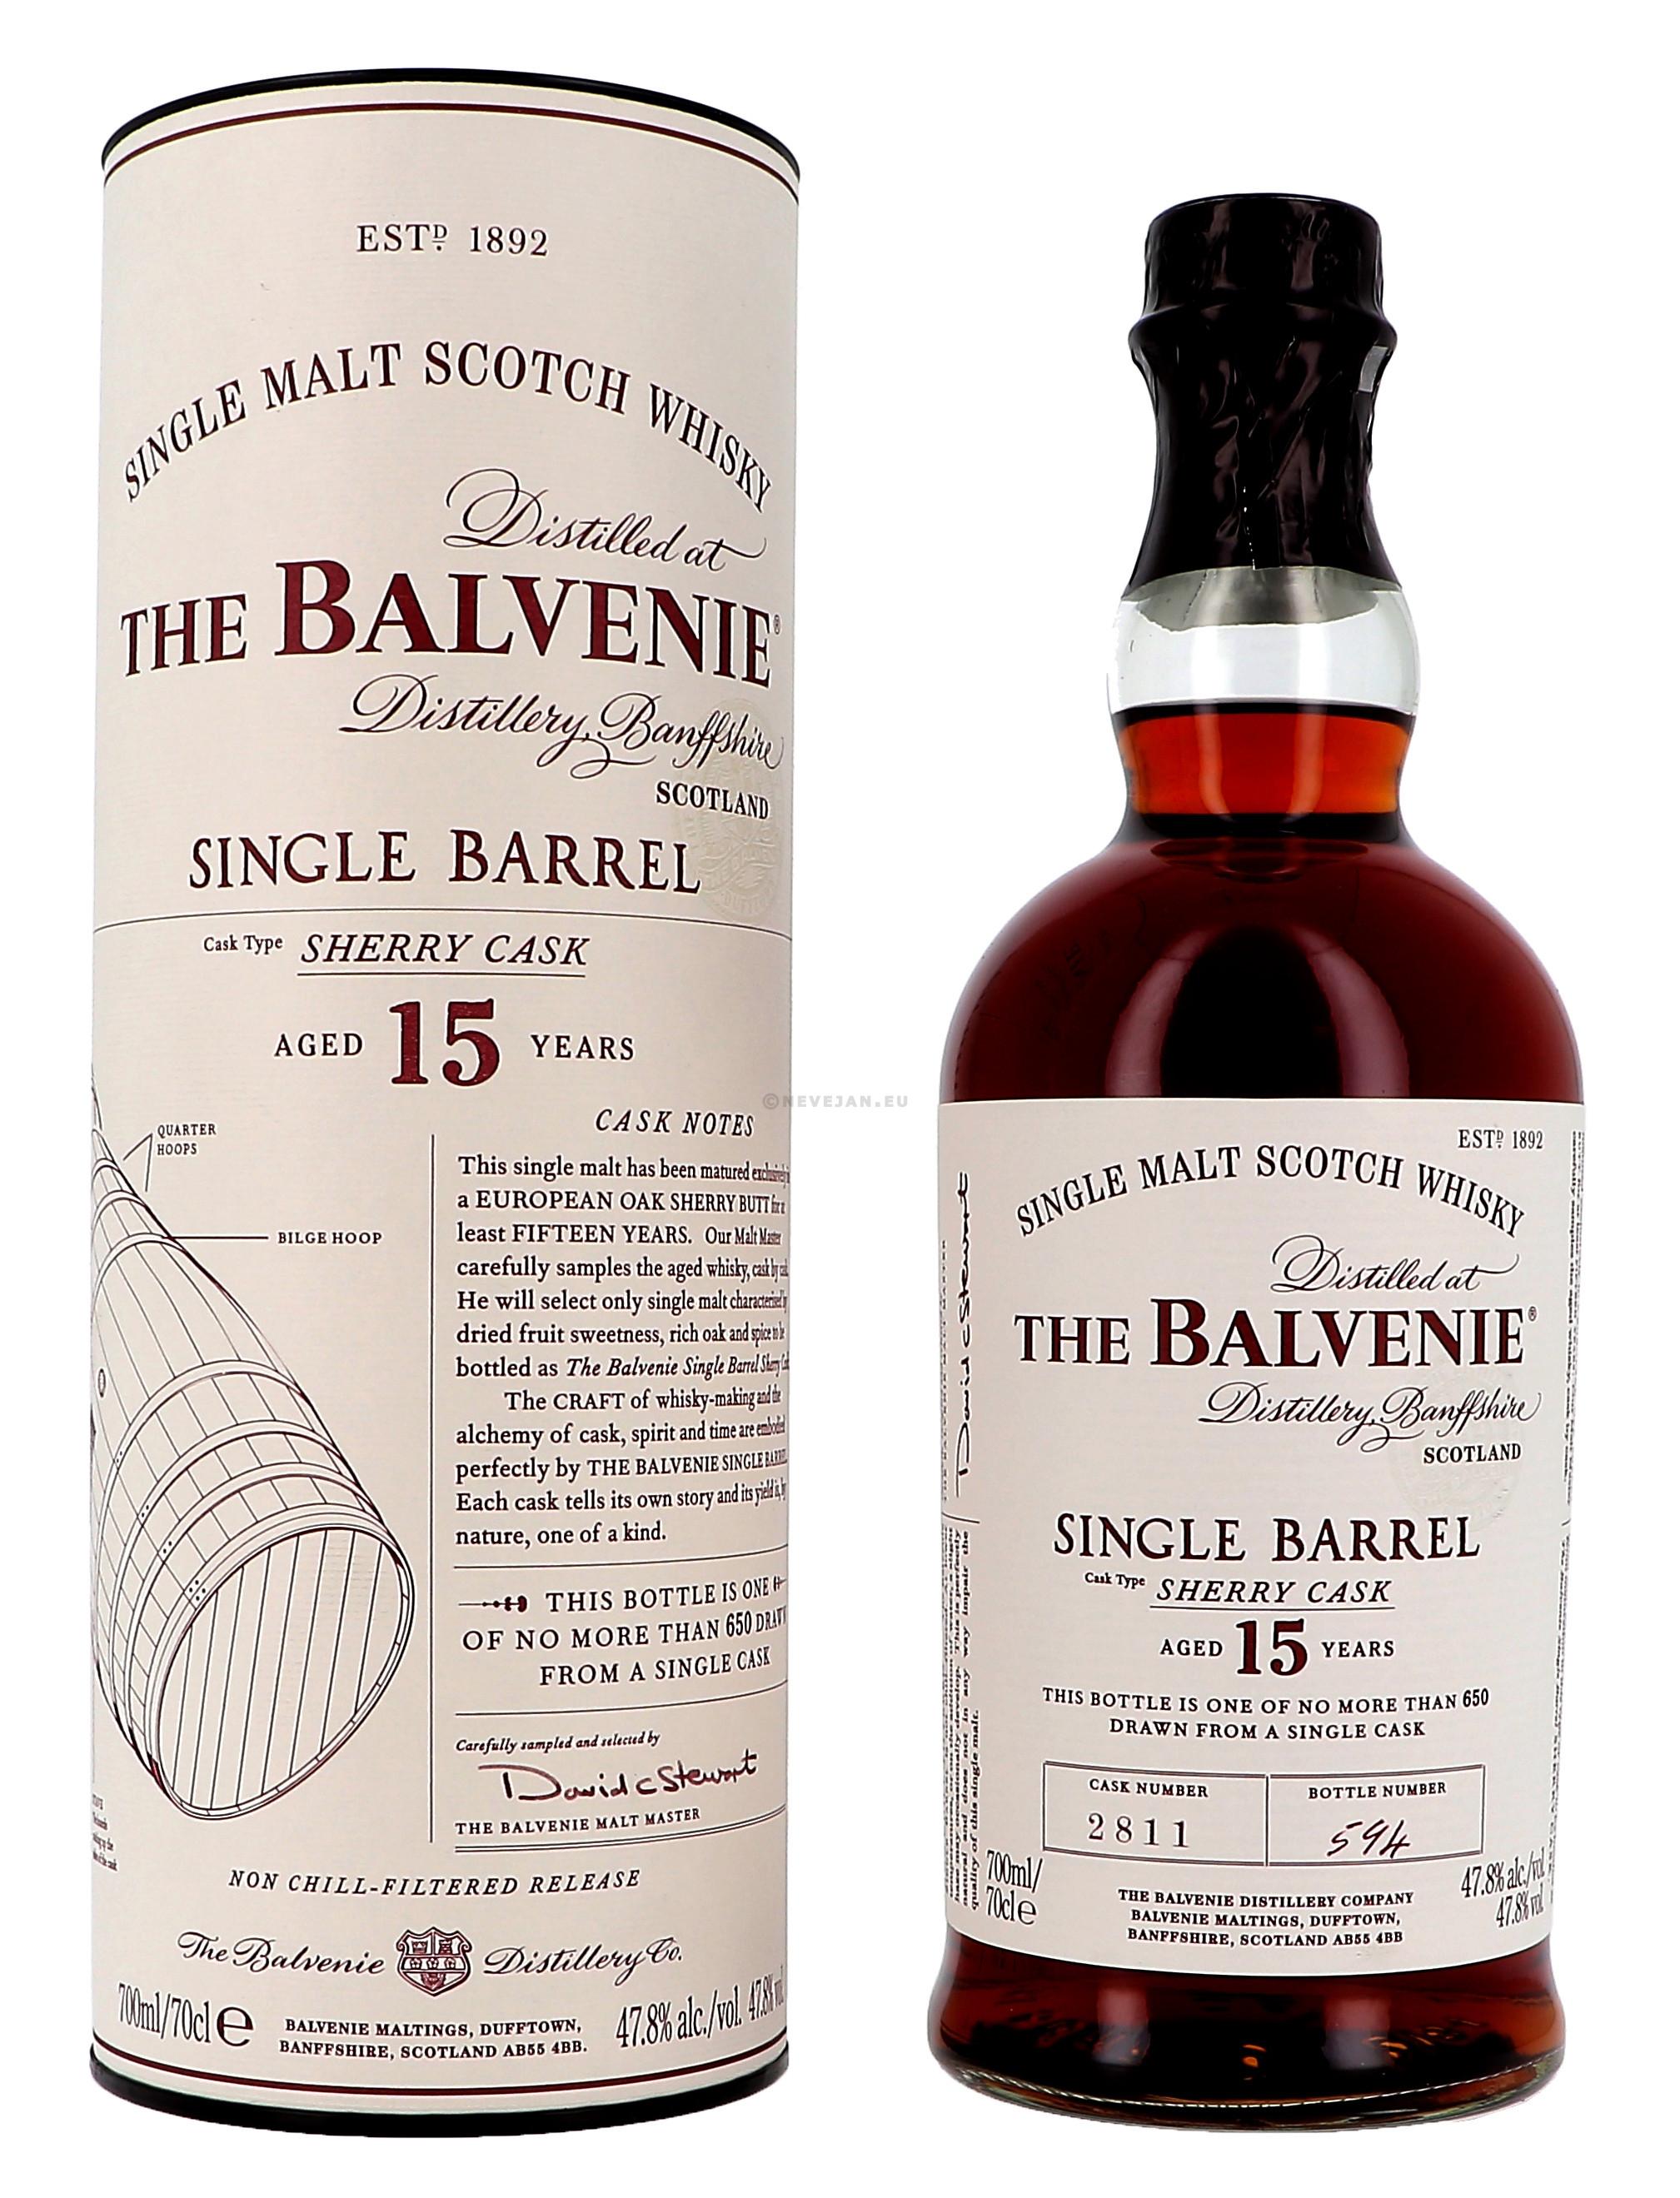 The Balvenie Single Barrel 15 Years 70cl 47.8% Speyside Single Malt Scotch Whisky (Whisky)